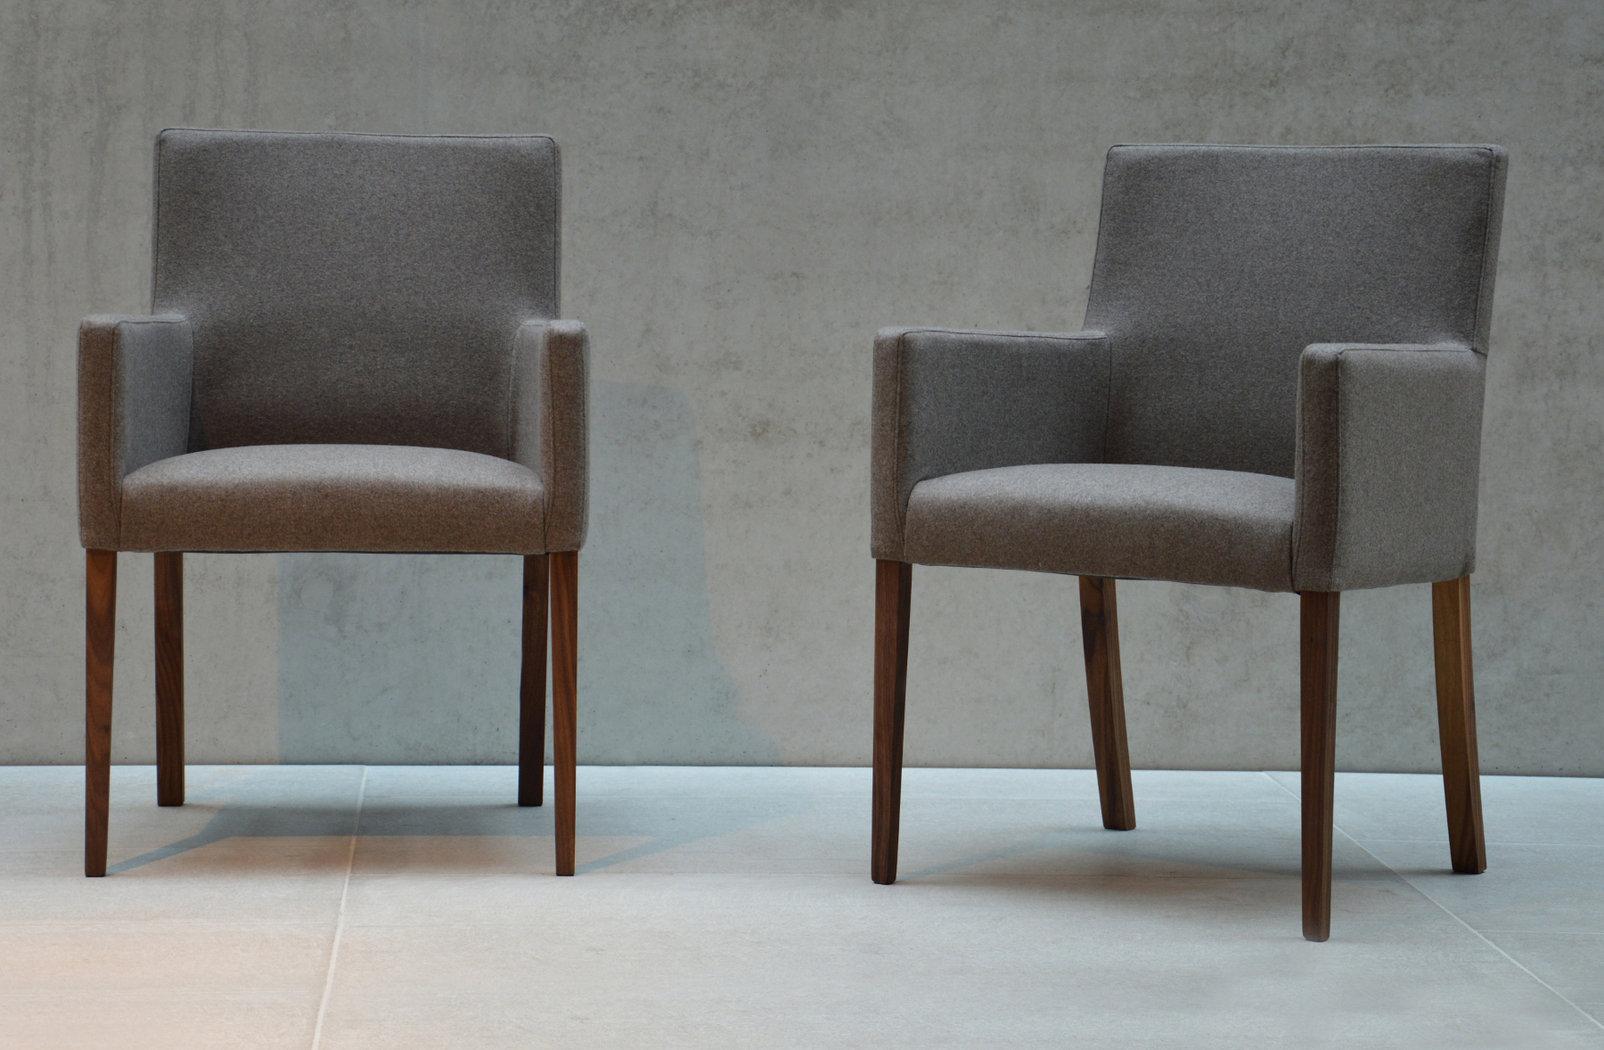 jan kurtz augus nussbaum loden sessel mit wollbezug teakwoodstore24. Black Bedroom Furniture Sets. Home Design Ideas